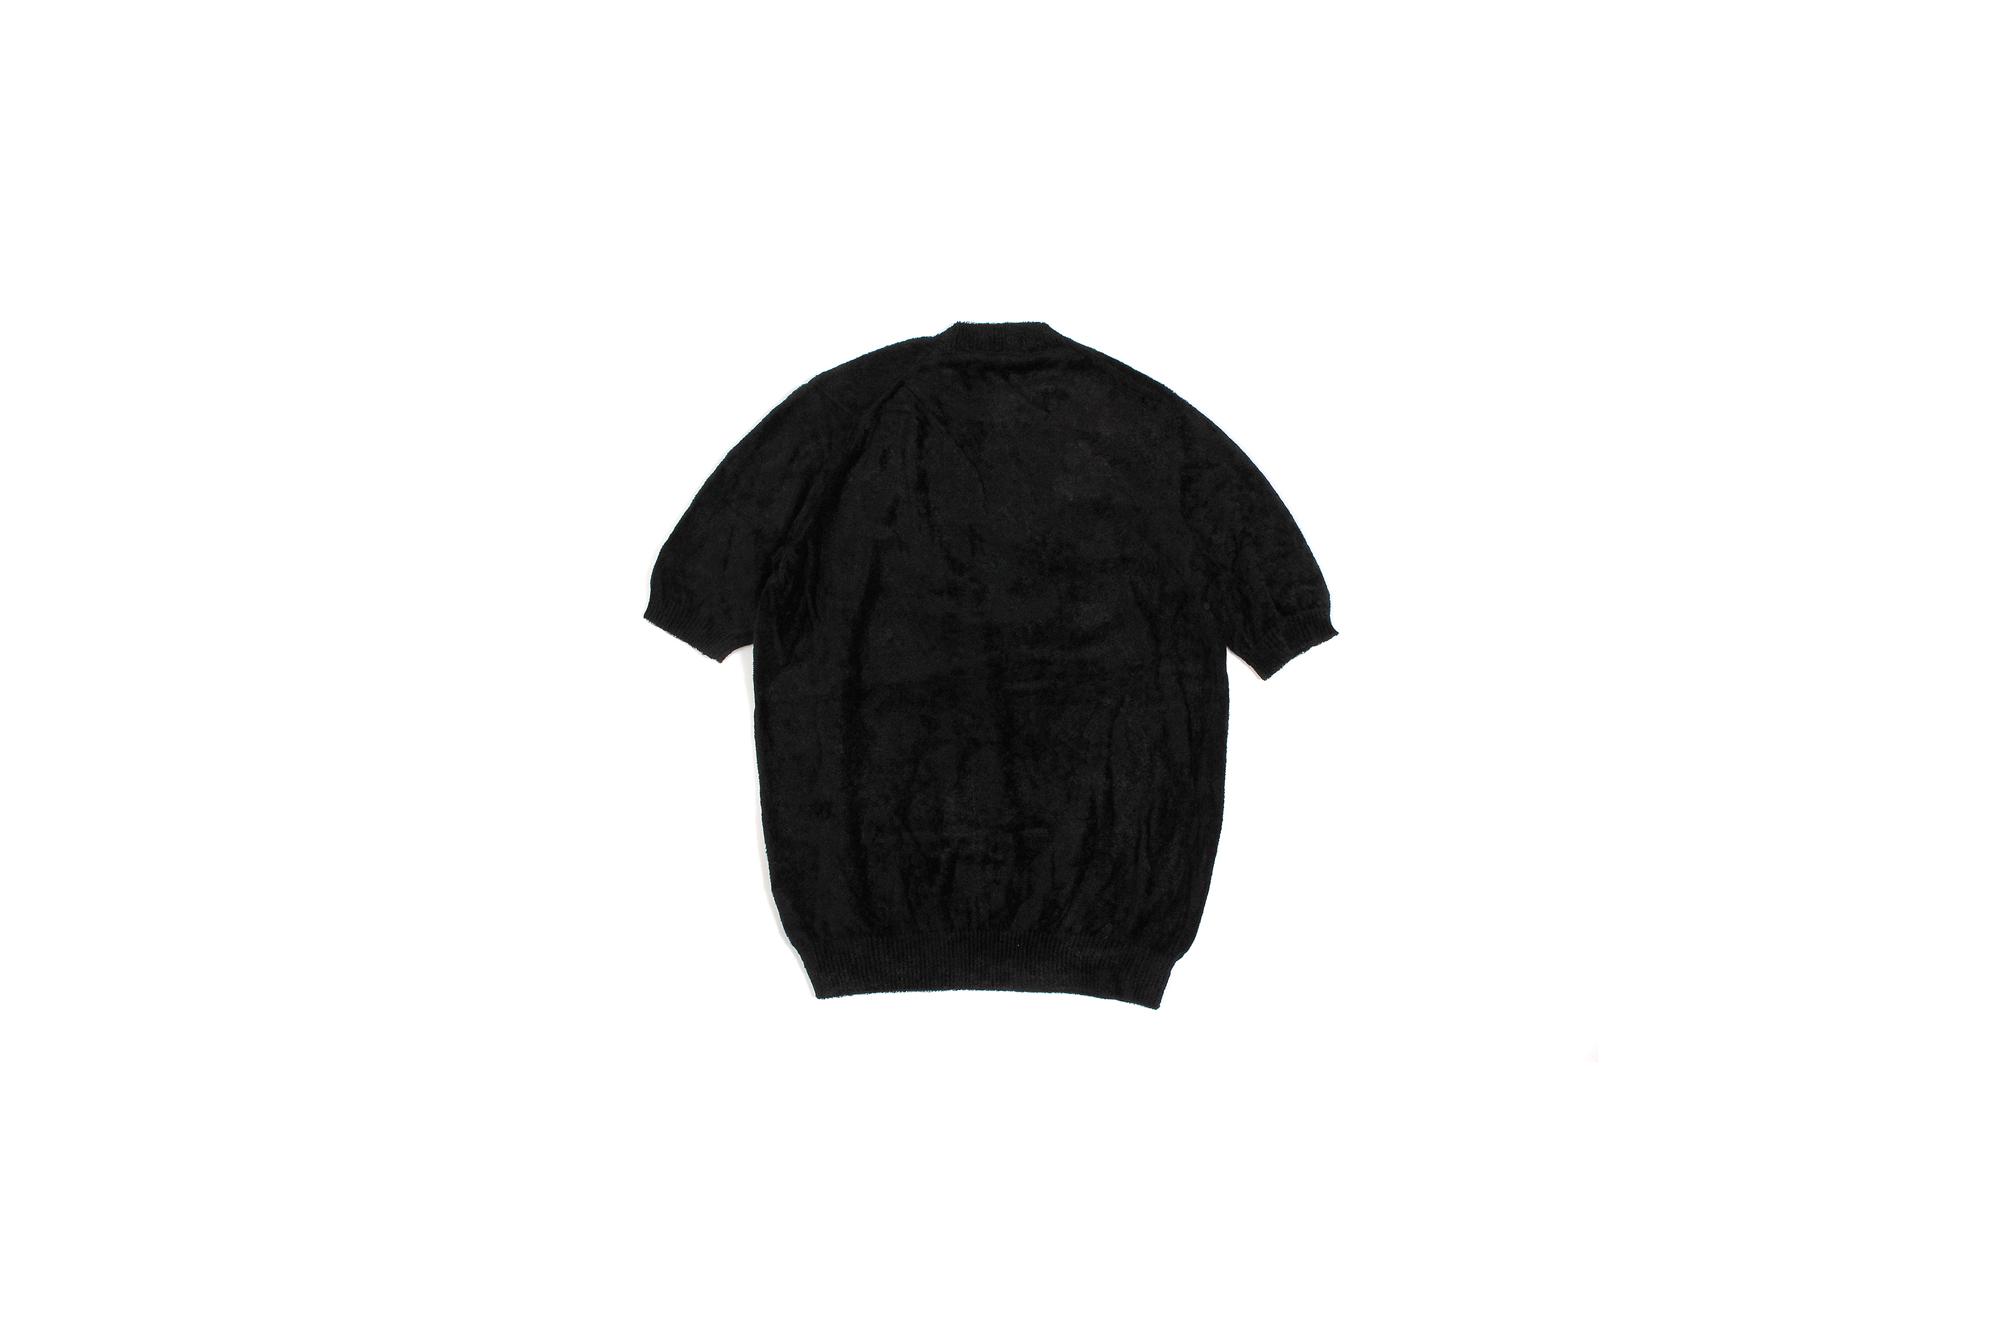 Settefili Cashmere (セッテフィーリ カシミア) Pile Knit T-shirt パイルニットTシャツ BLACK (ブラック・GD03) made in italy (イタリア製) 2020 春夏新作 愛知 名古屋 altoediritto アルトエデリット